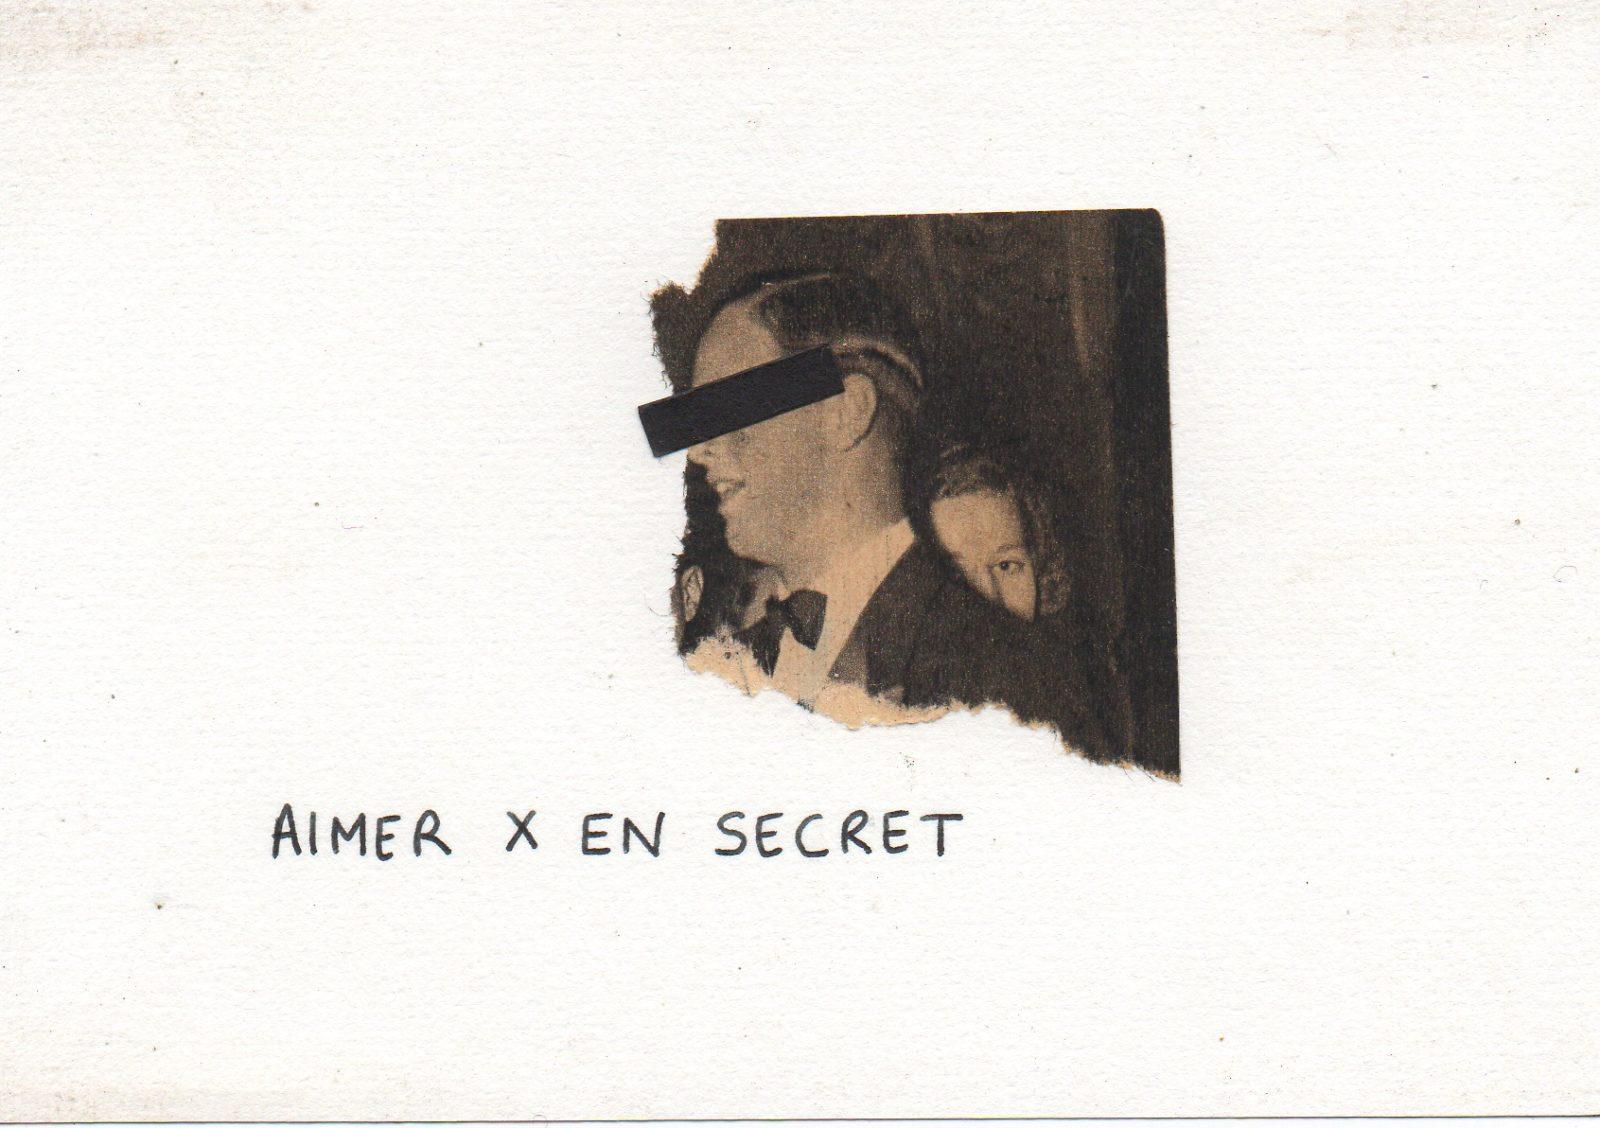 aimer x en secret